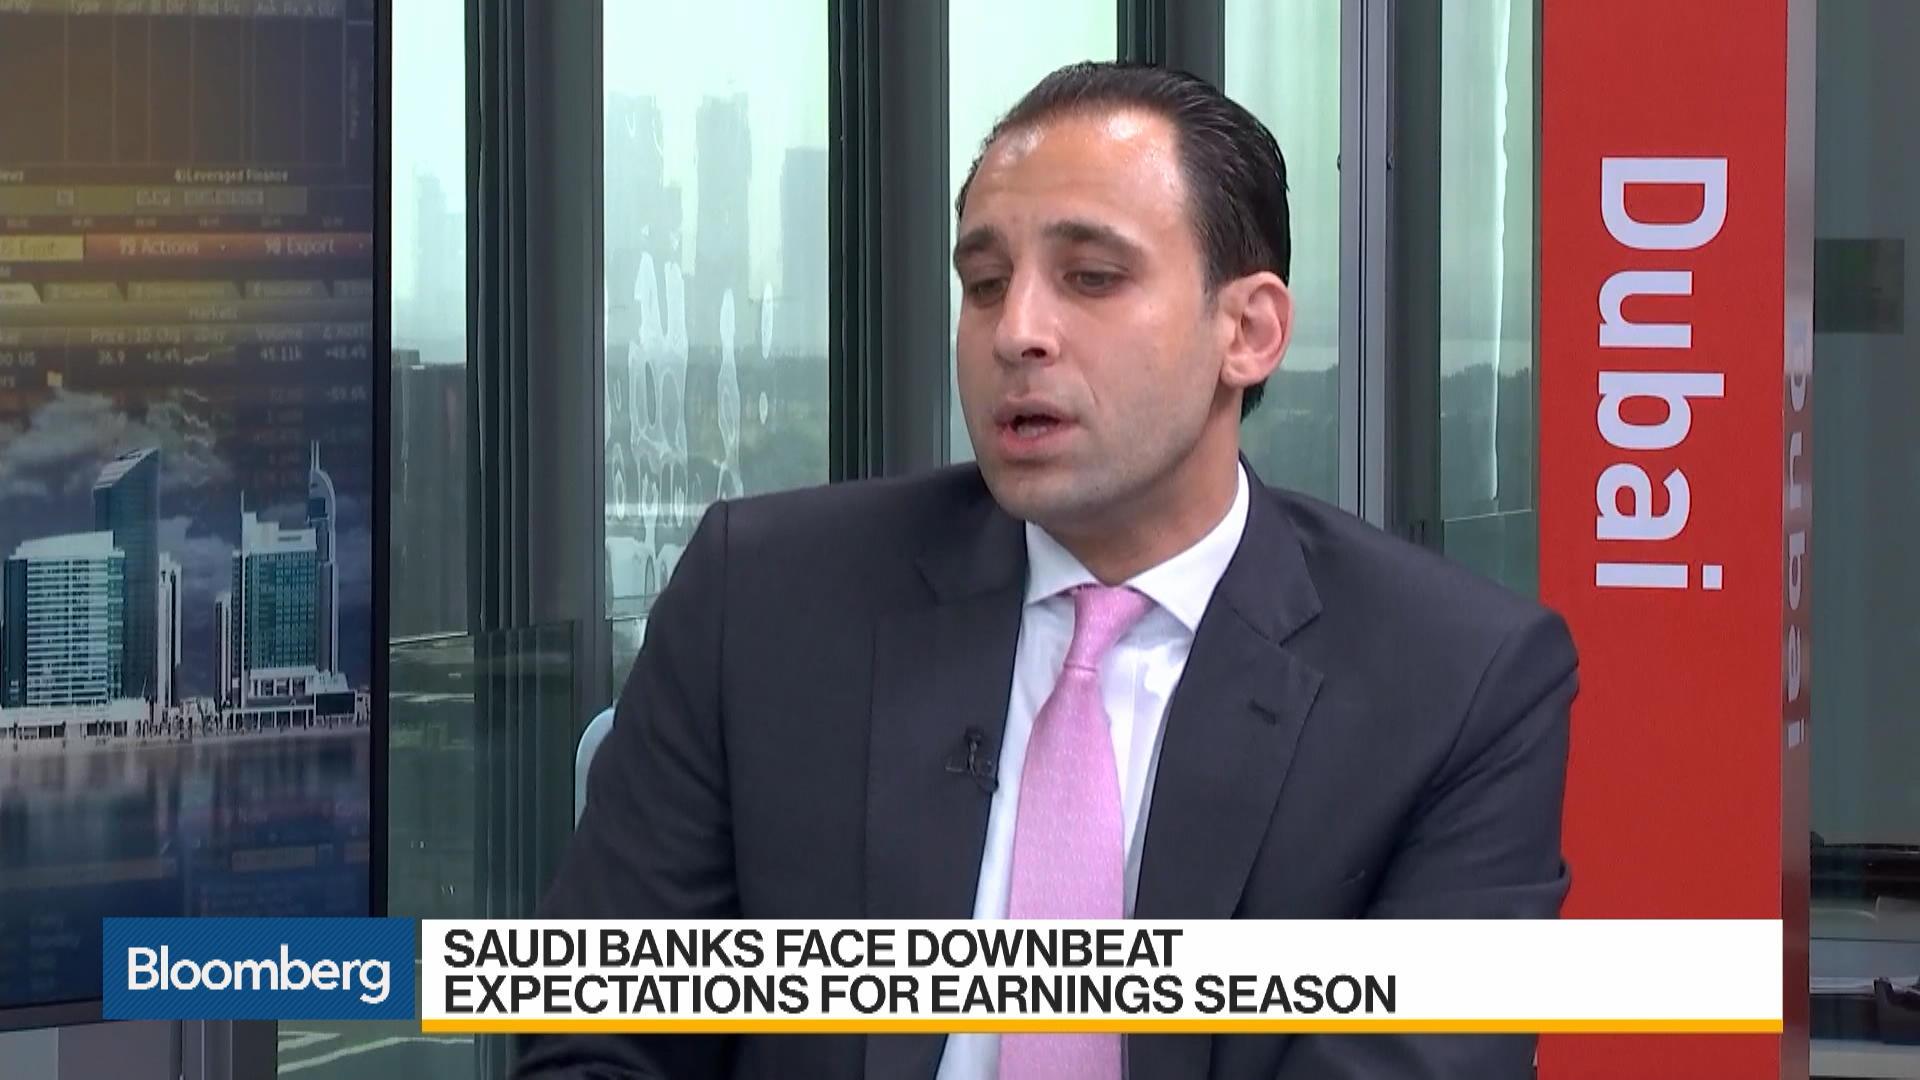 Ali El Adou, Head of Asset Management at Daman Investments, on Saudi Arabian Banks